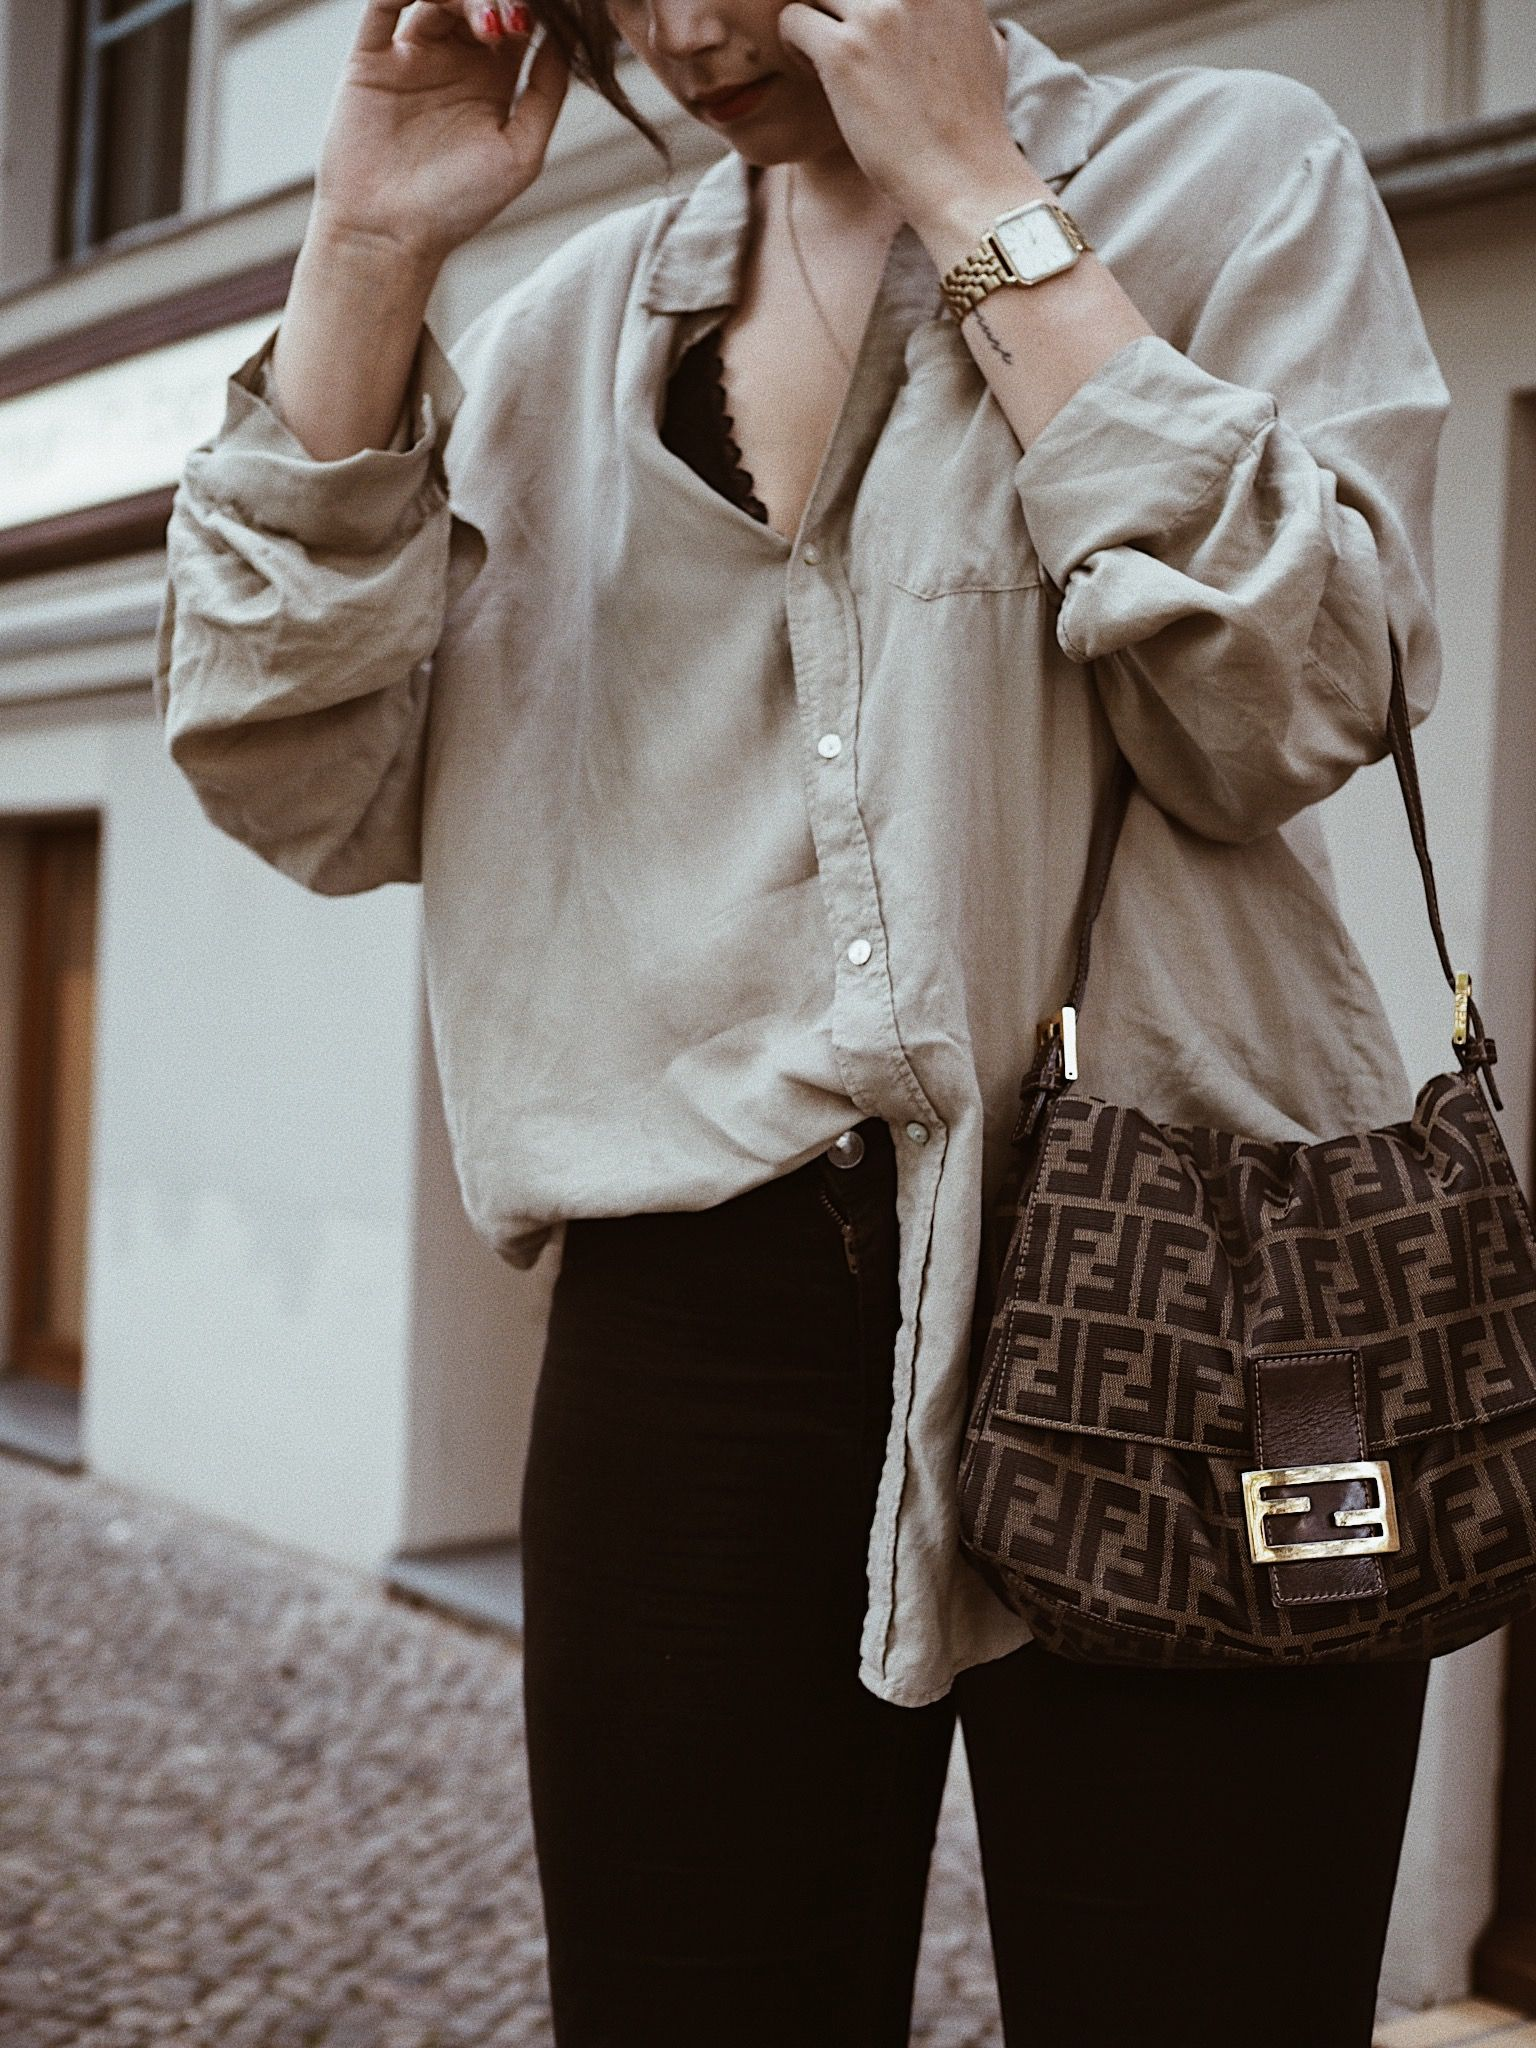 967a9eea9ce8df FASHIONLUNCH - Blogazine aus Berlin - Tara Wittwer Fendi Bags, Gucci  Handbags, Hermes Bags